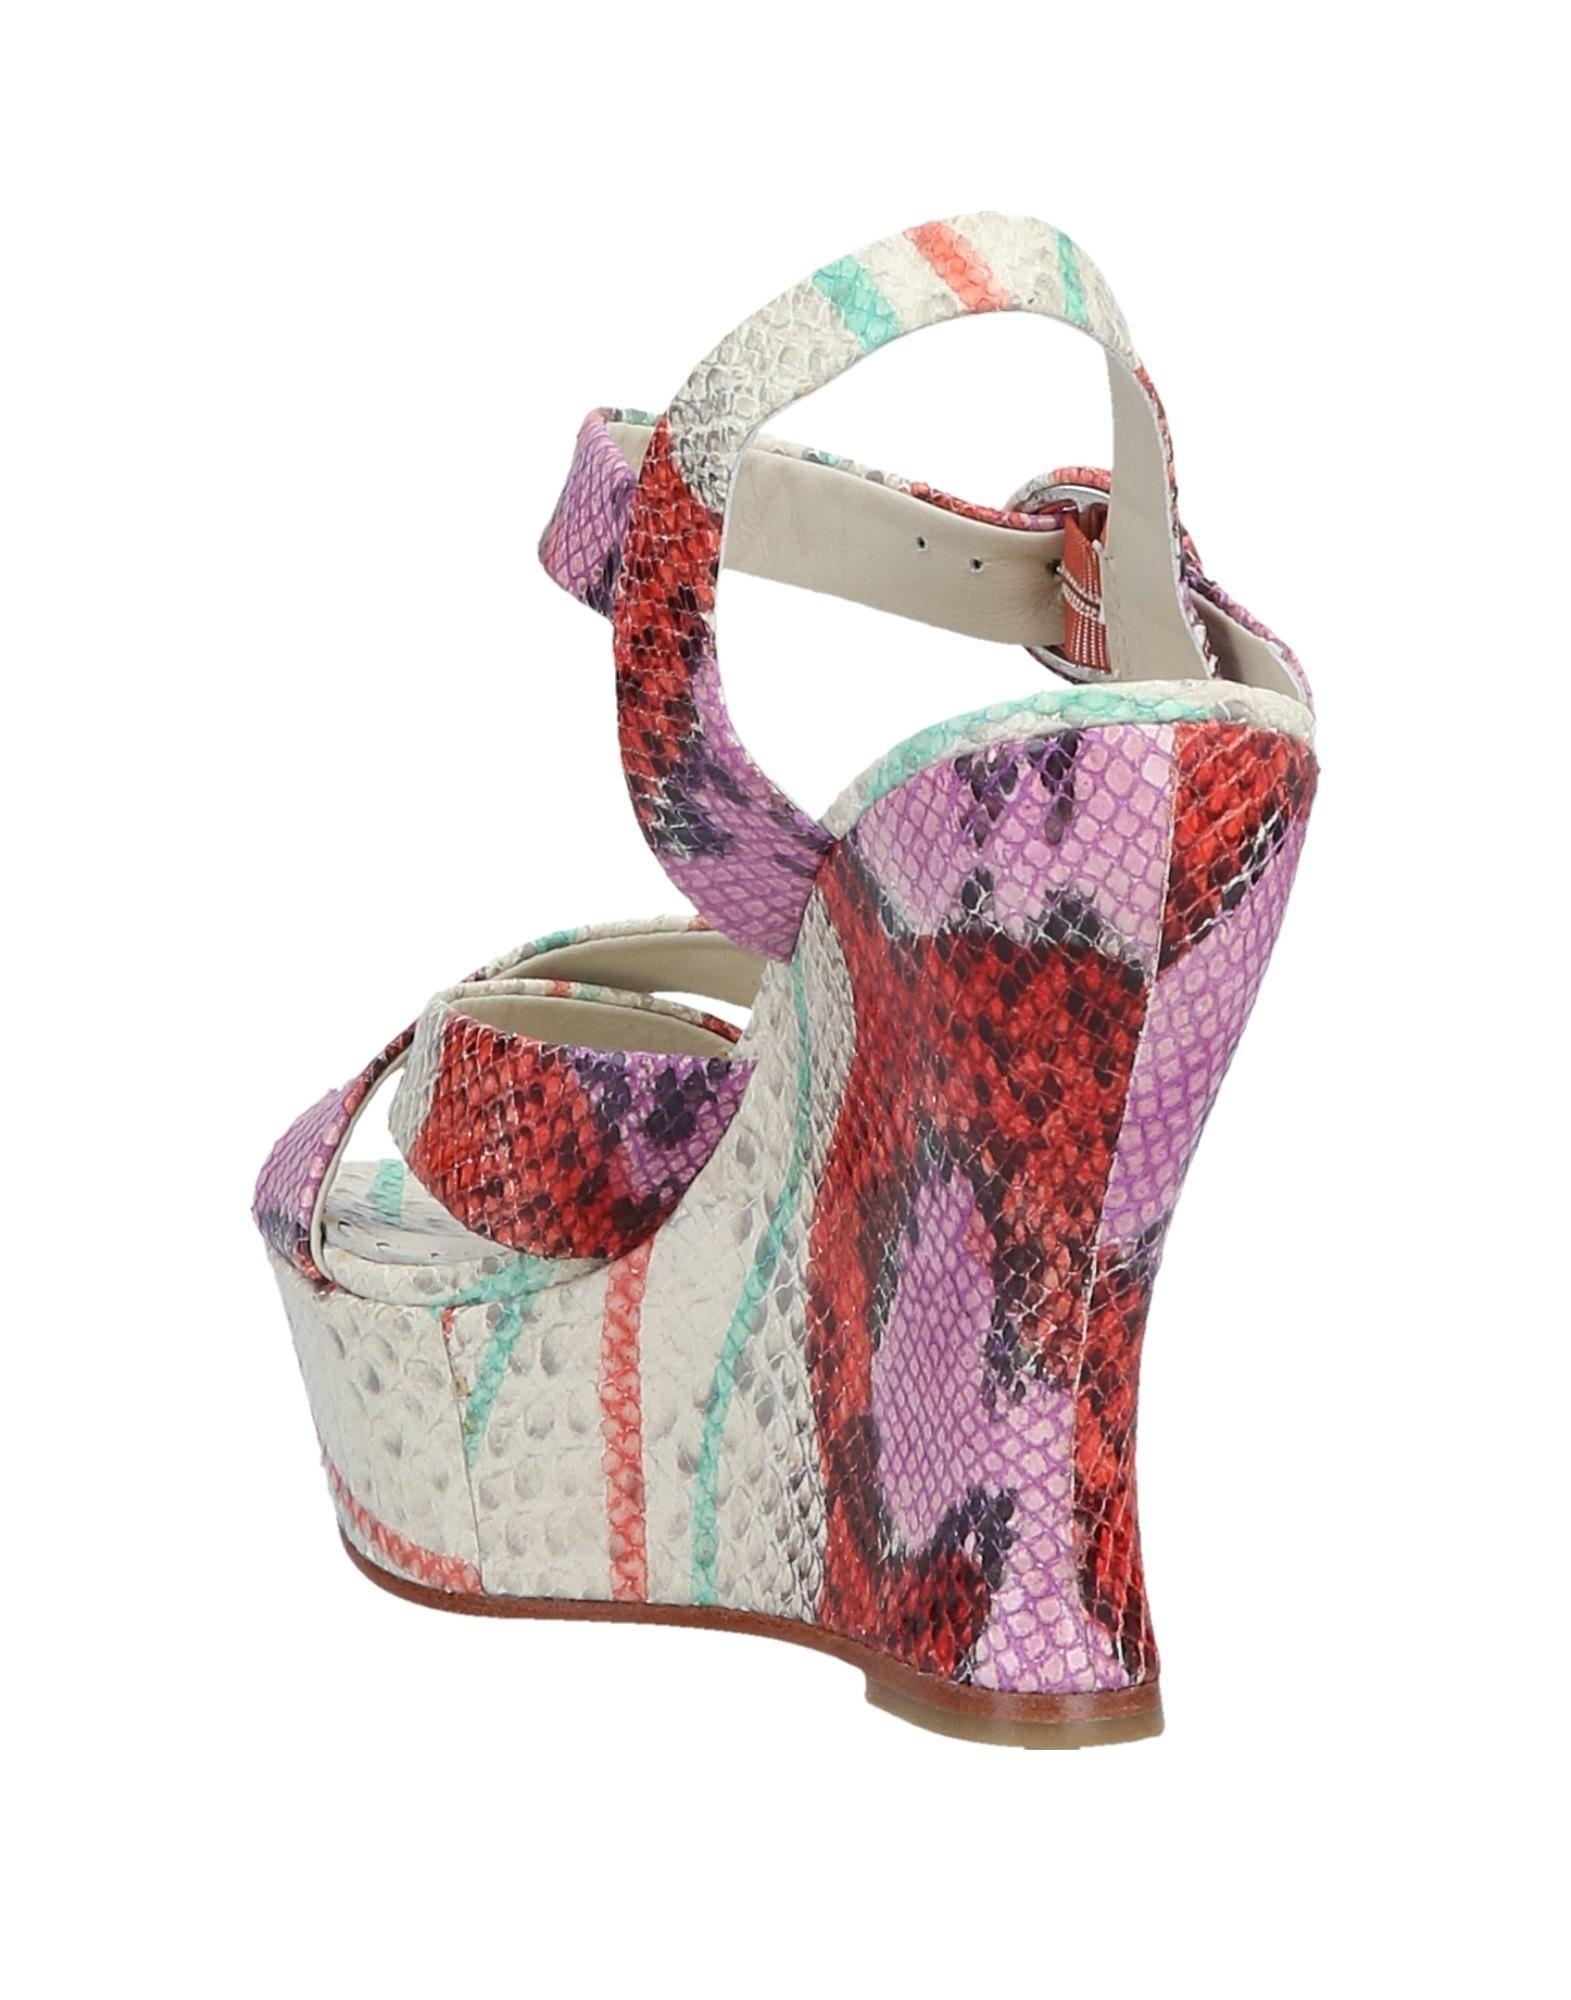 Stilvolle billige Schuhe Damen Alice + Olivia Sandalen Damen Schuhe  11567190DH 649e4f